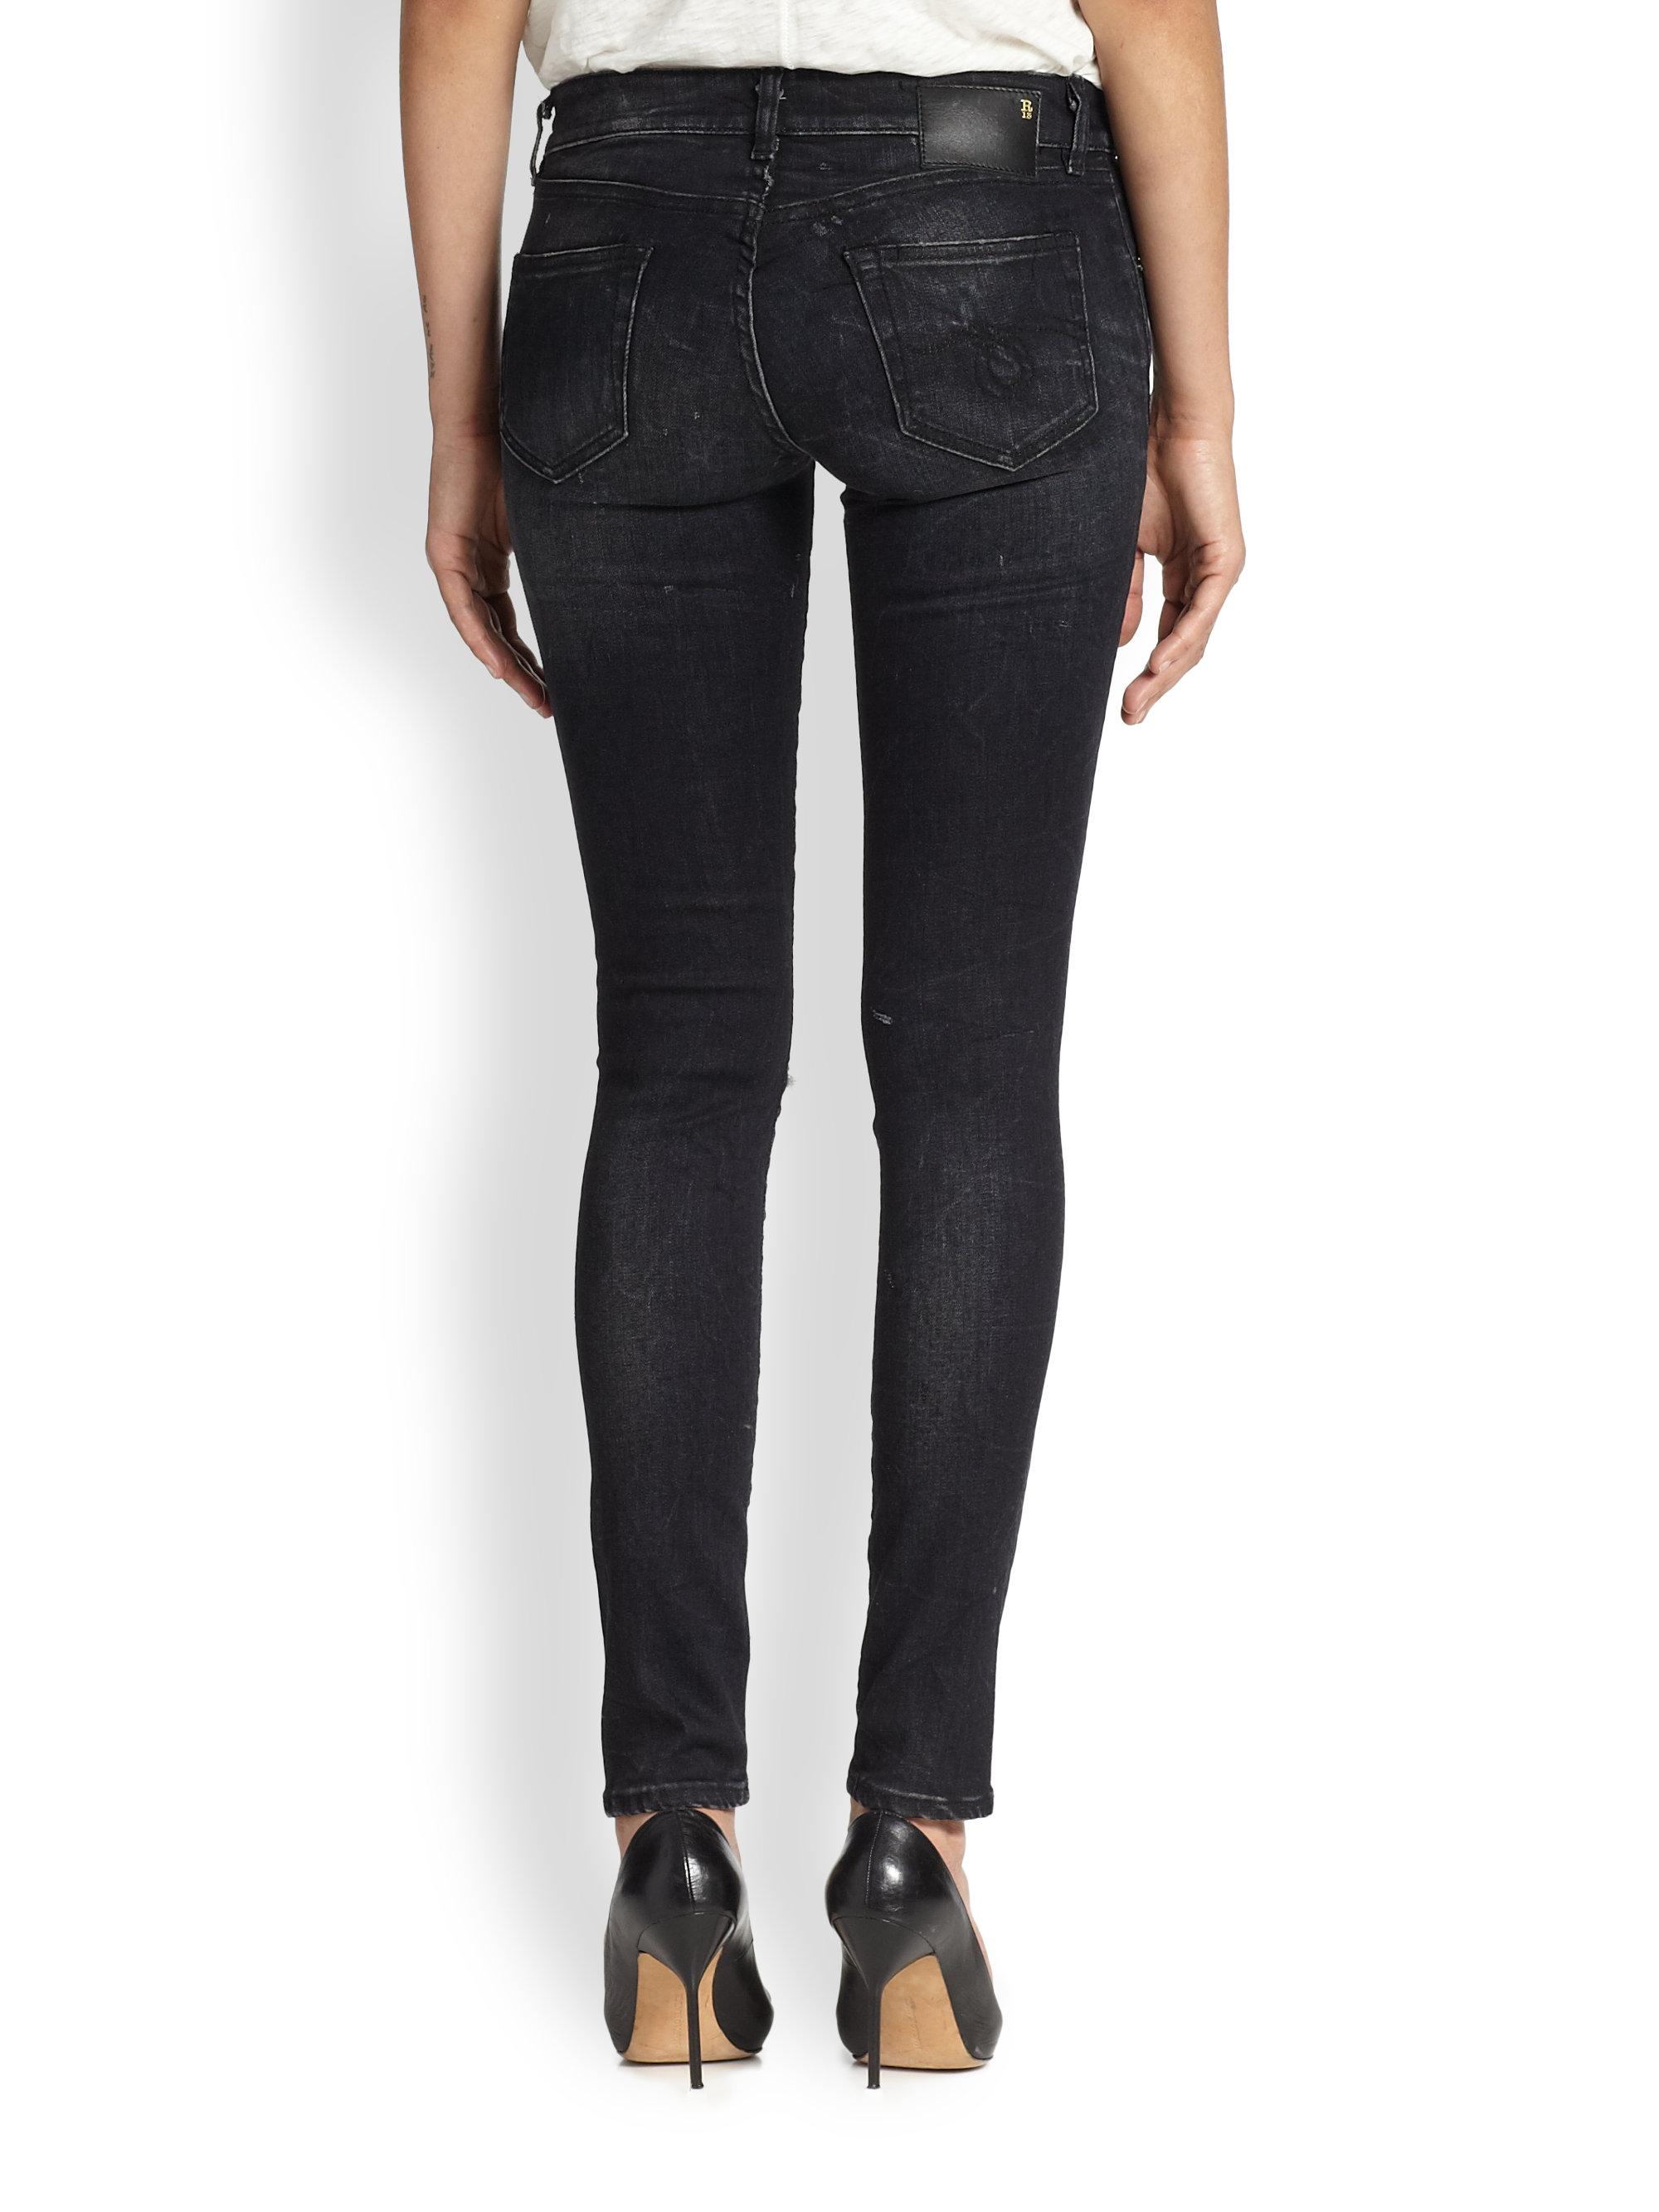 R13 Distressed Skinny Jeans in Black | Lyst